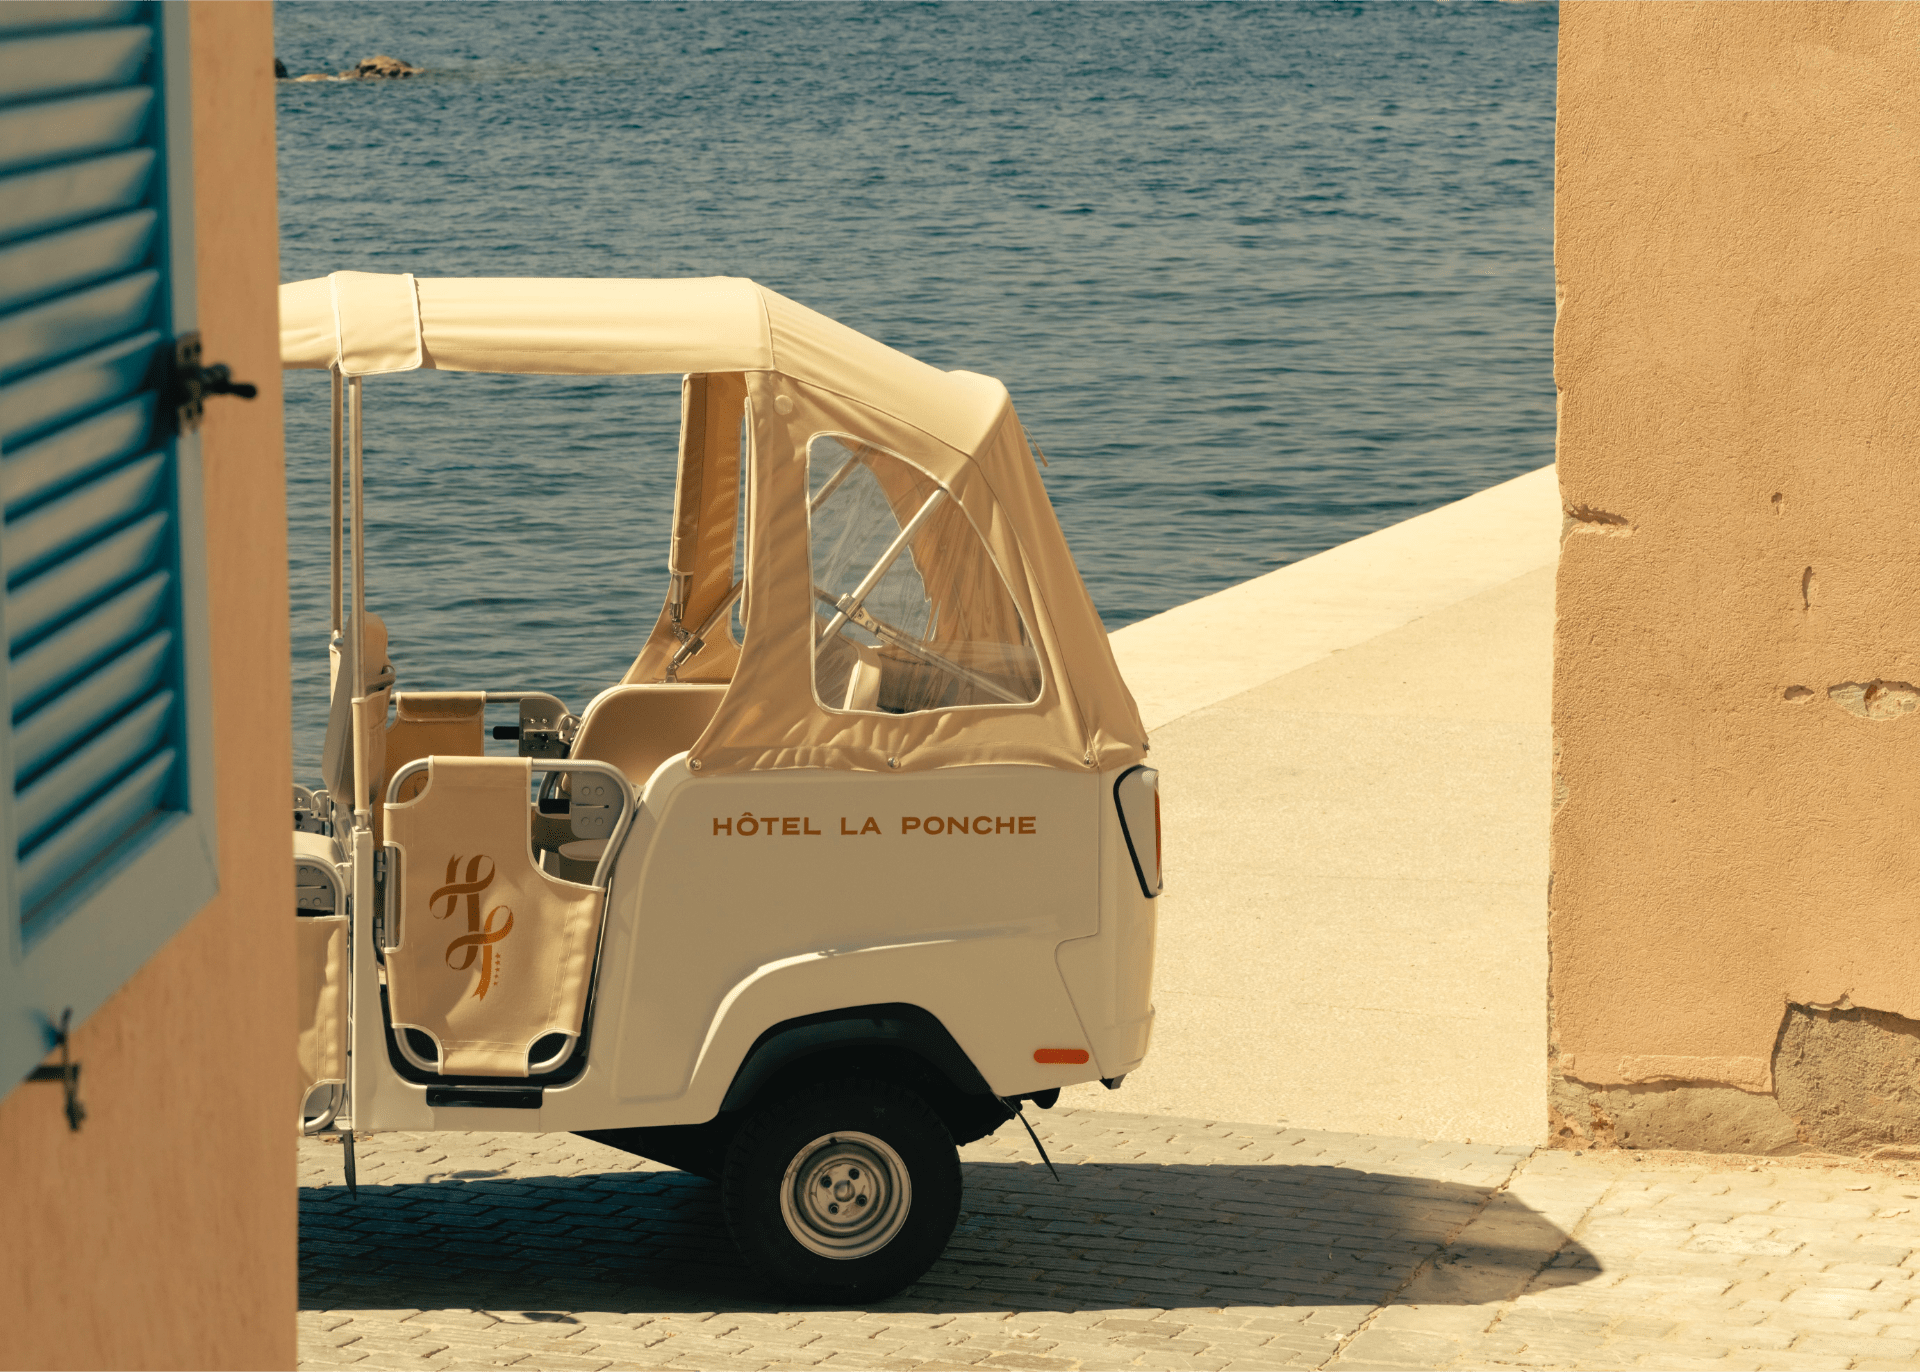 OldWorld French Summer Htel La Ponche in SaintTropez The charming transportation.